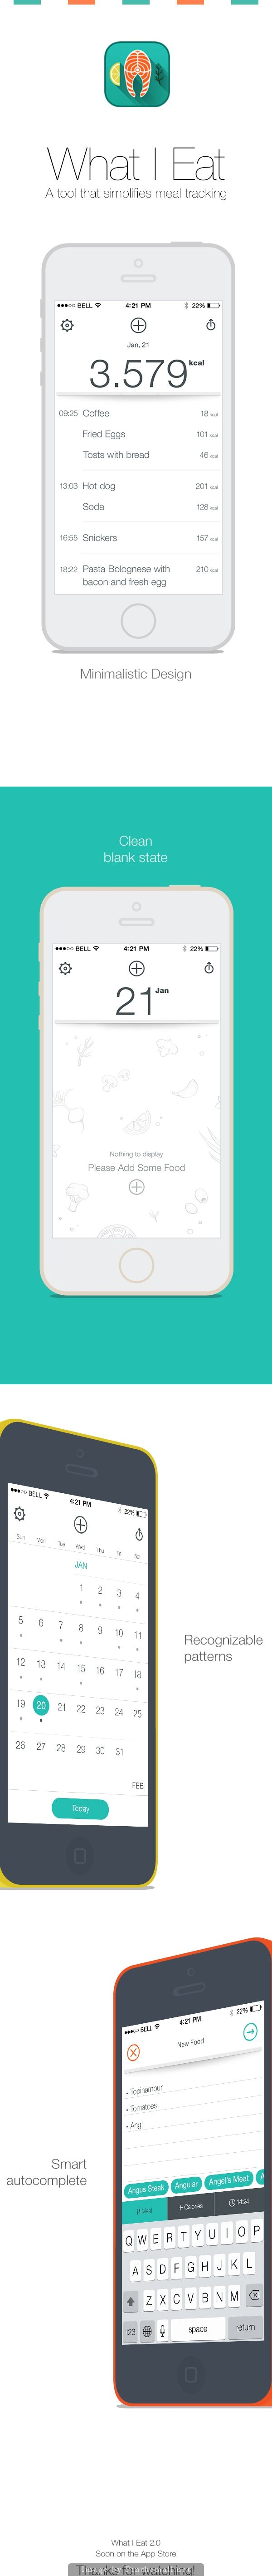 What I Eat App 2.0